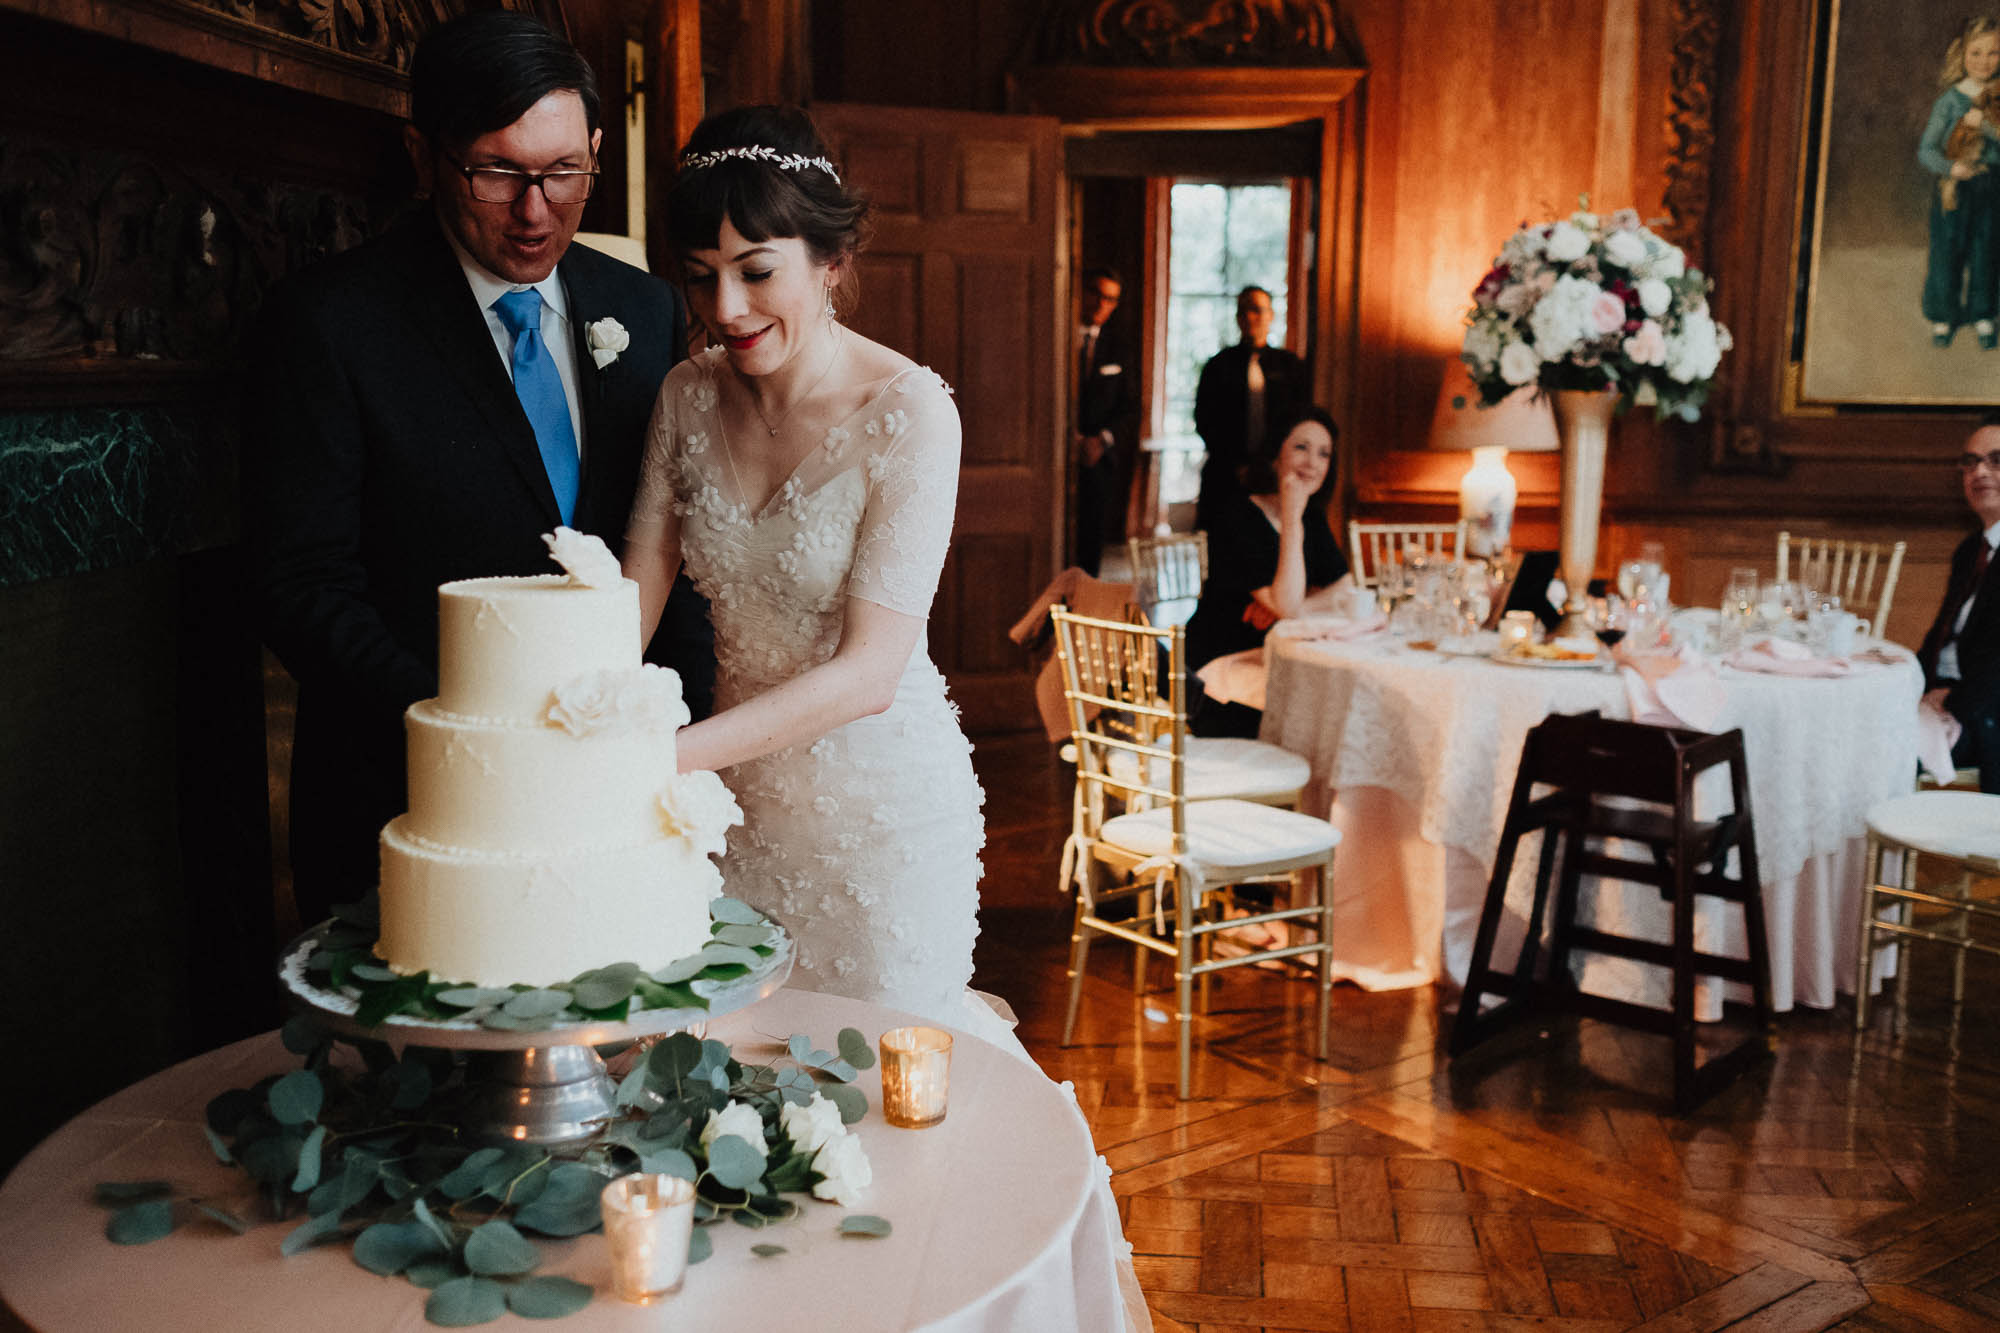 Claudia-Stephen-Peterloon-Wedding-Cincinnati-Ohio-083.jpg